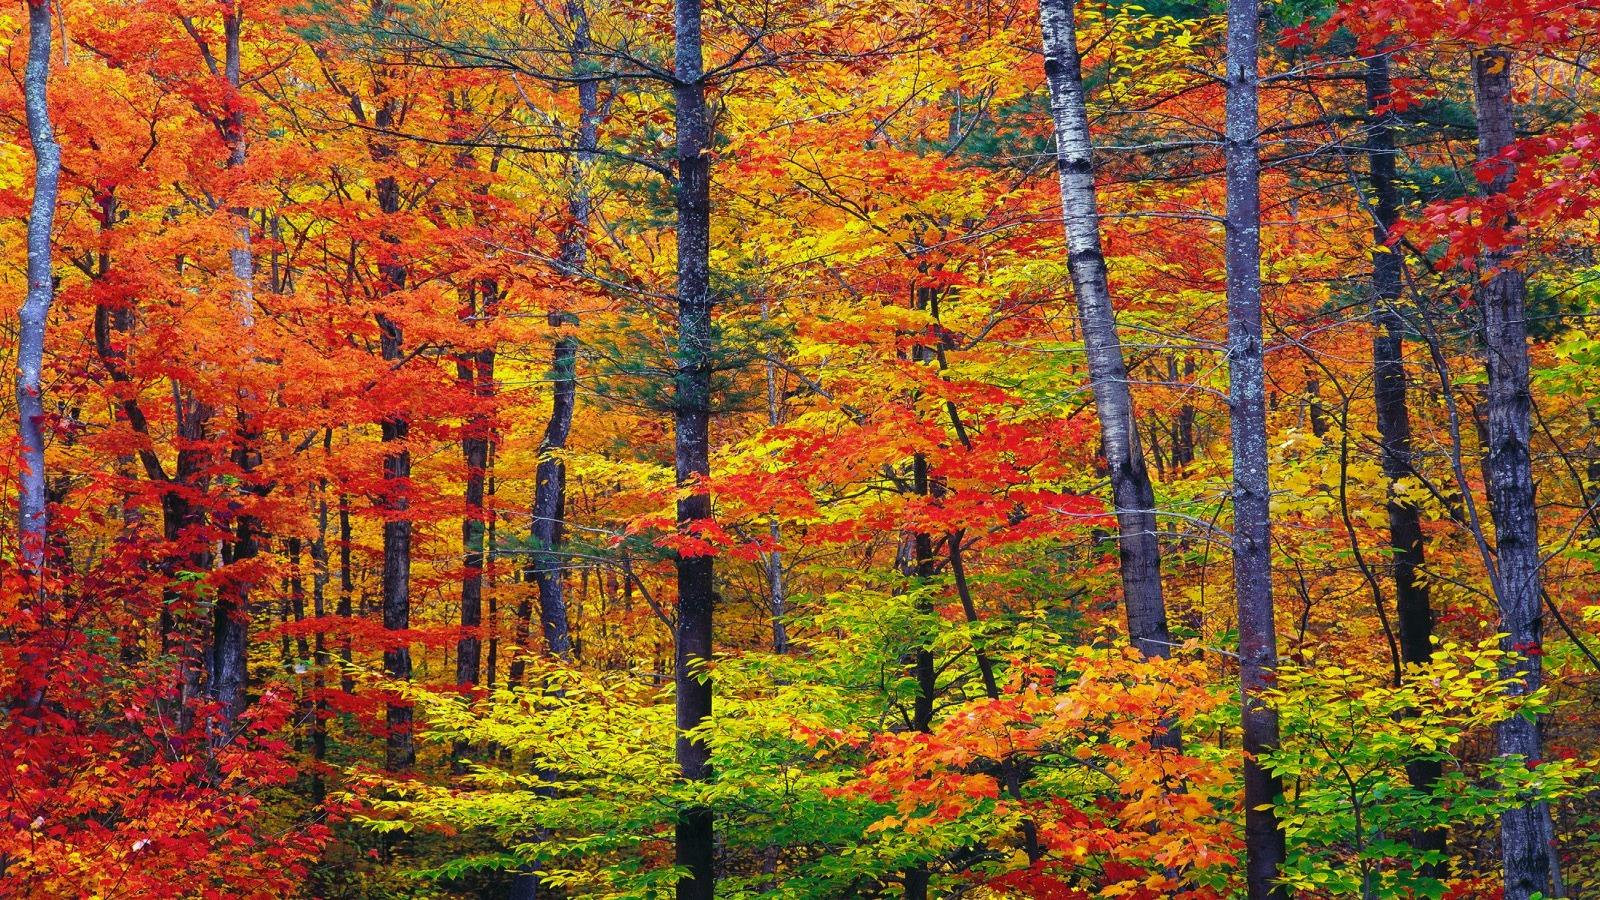 vibrant_autumn_colors_wallpaper_autumn_nature_wallpaper_1600_900 ...